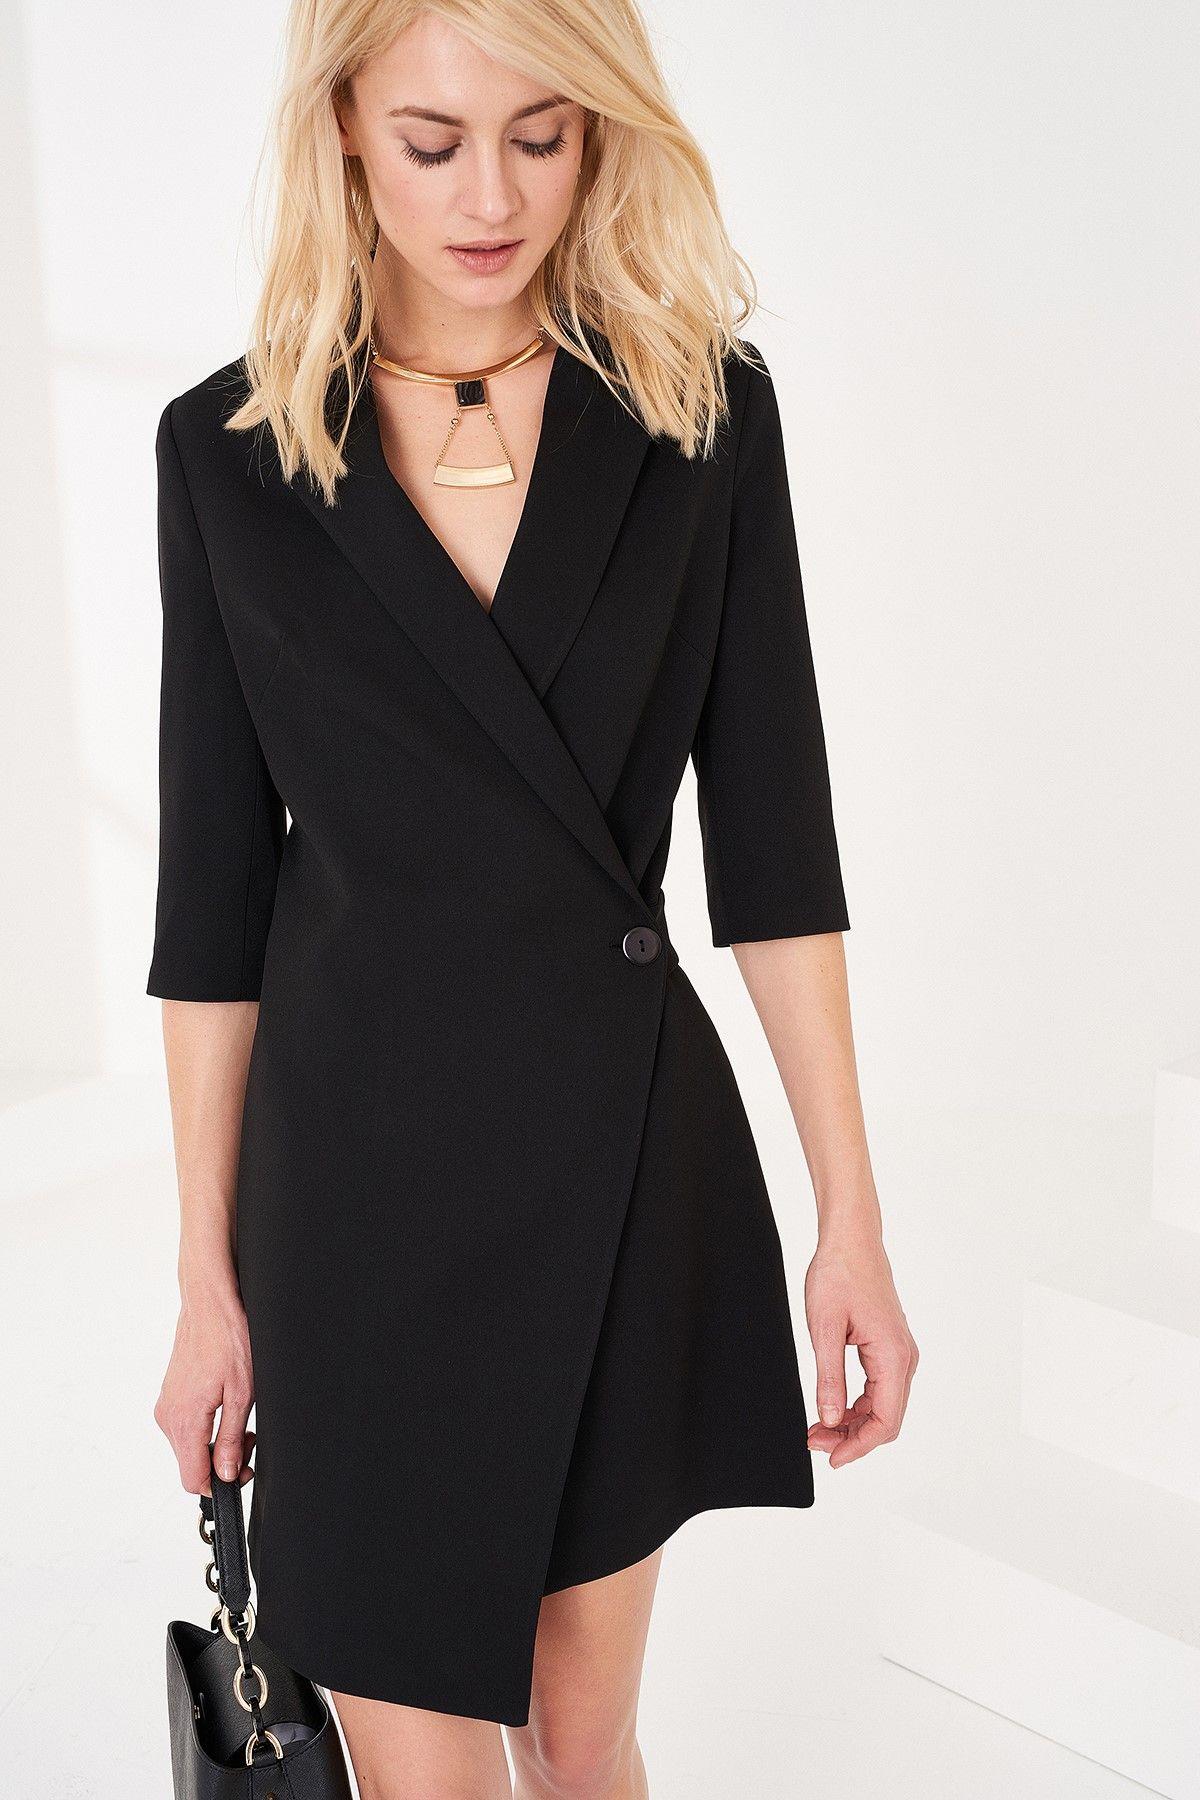 Siyah Onden Tek Dugmeli Ceket Elbise Trendyolmilla Trendyol Blazer Elbise Elbise Siyah Elbise